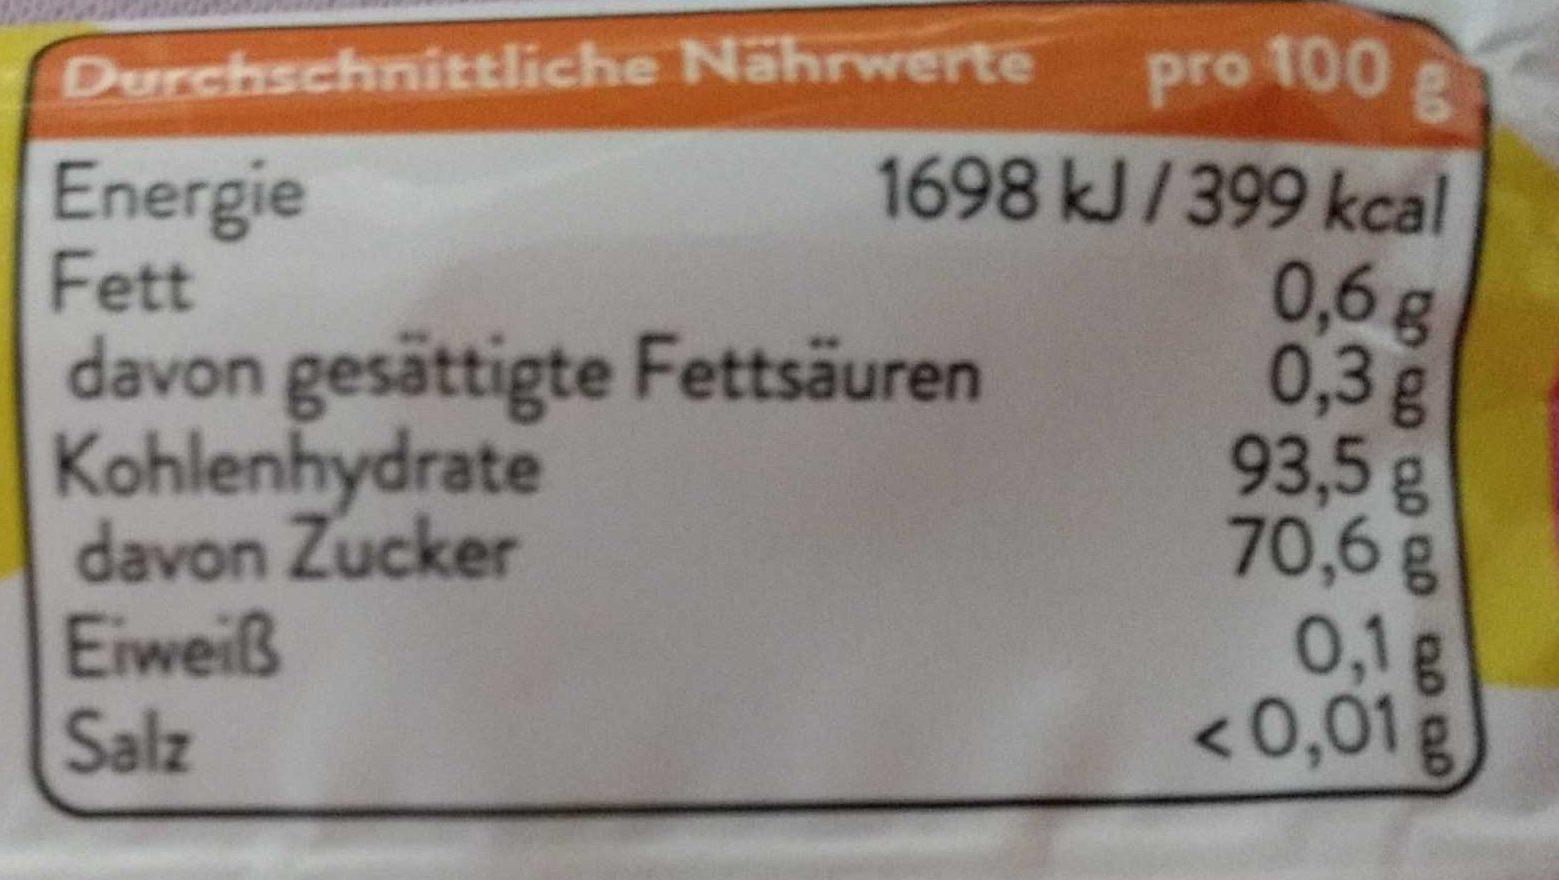 fresh:air fruit flavor - Nährwertangaben